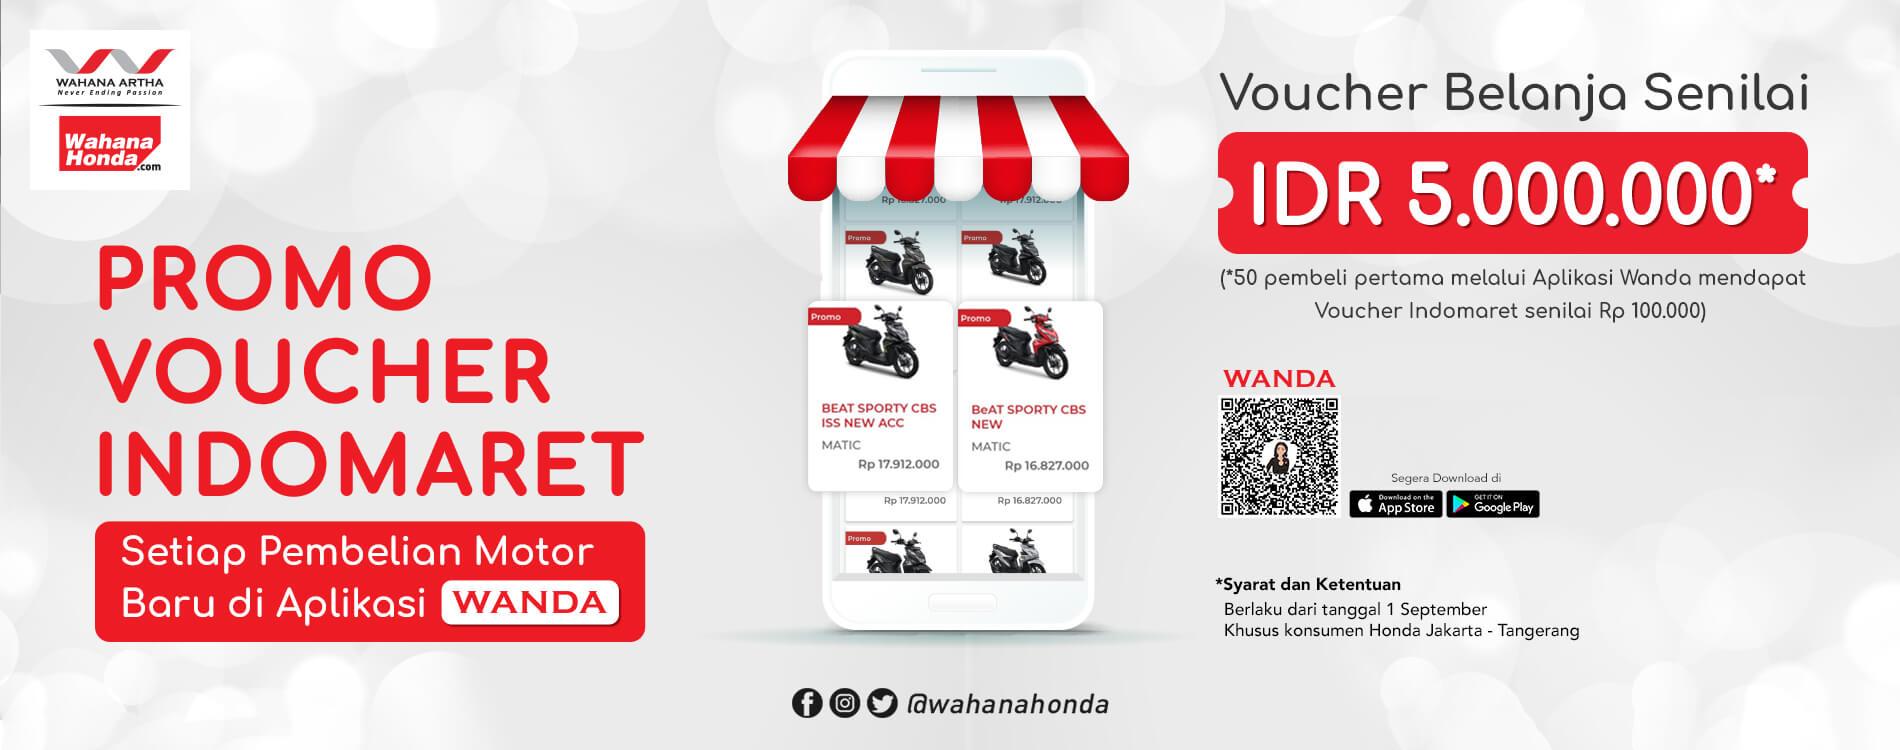 Promo Voucher Indomaret – Pembelian Motor Baru Di Aplikasi Wanda